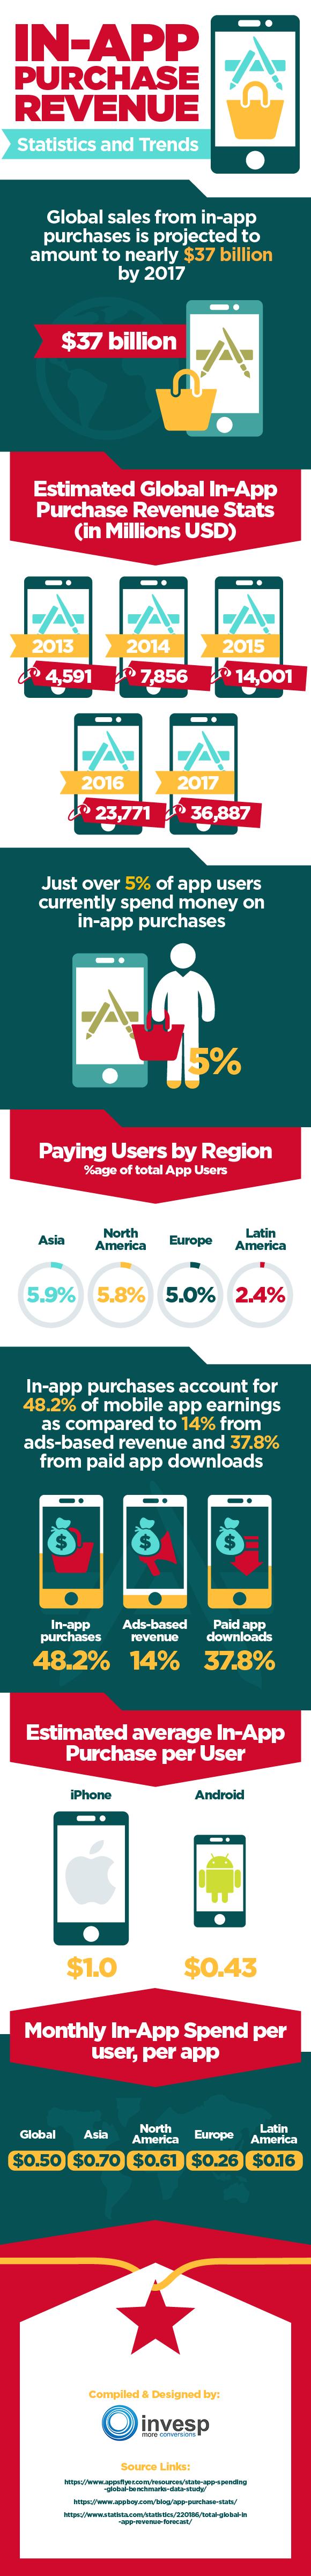 infografia-compras-in-app